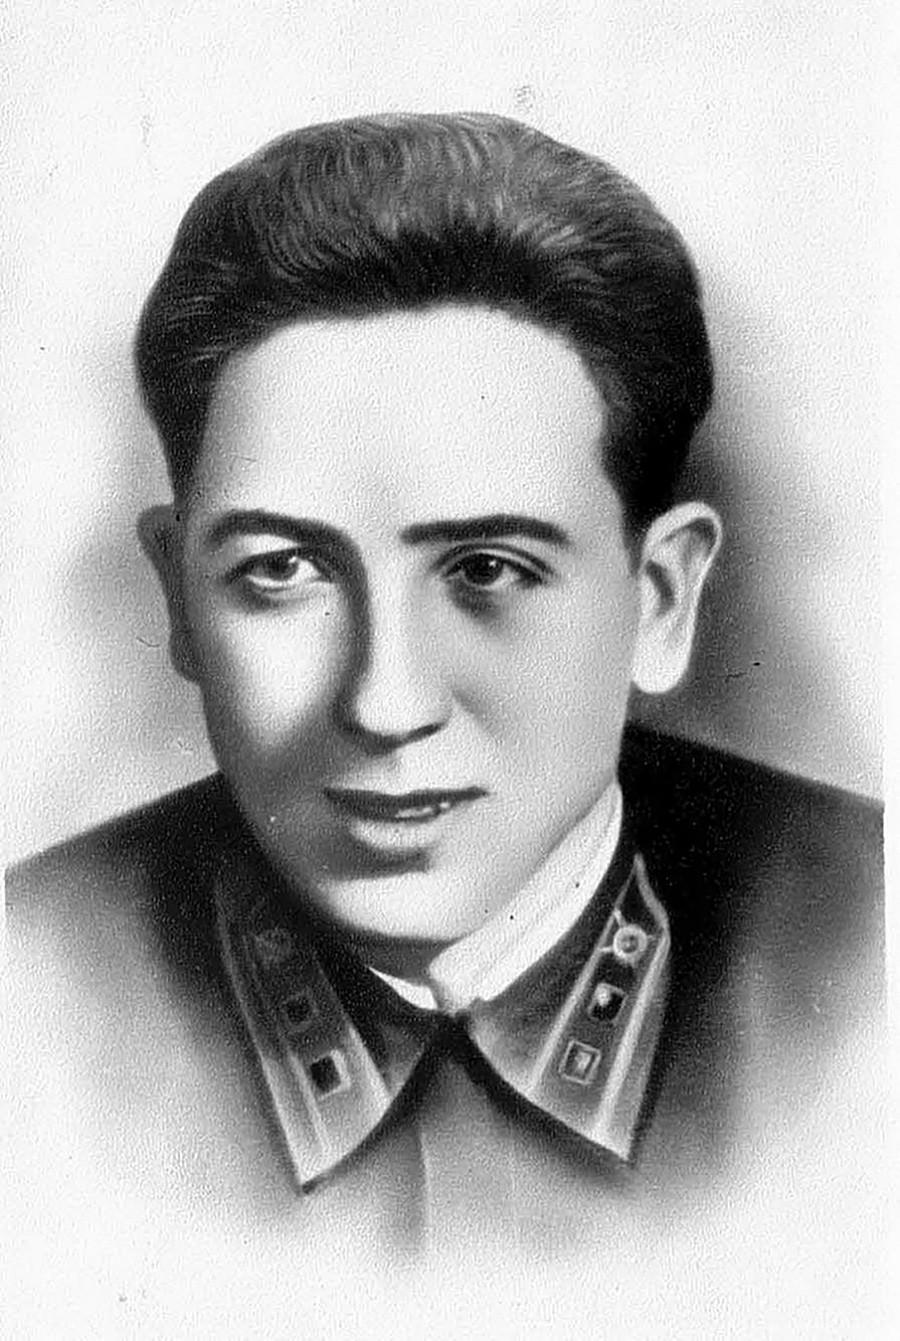 Херој Совјетског Савеза Рубен Ибарури.